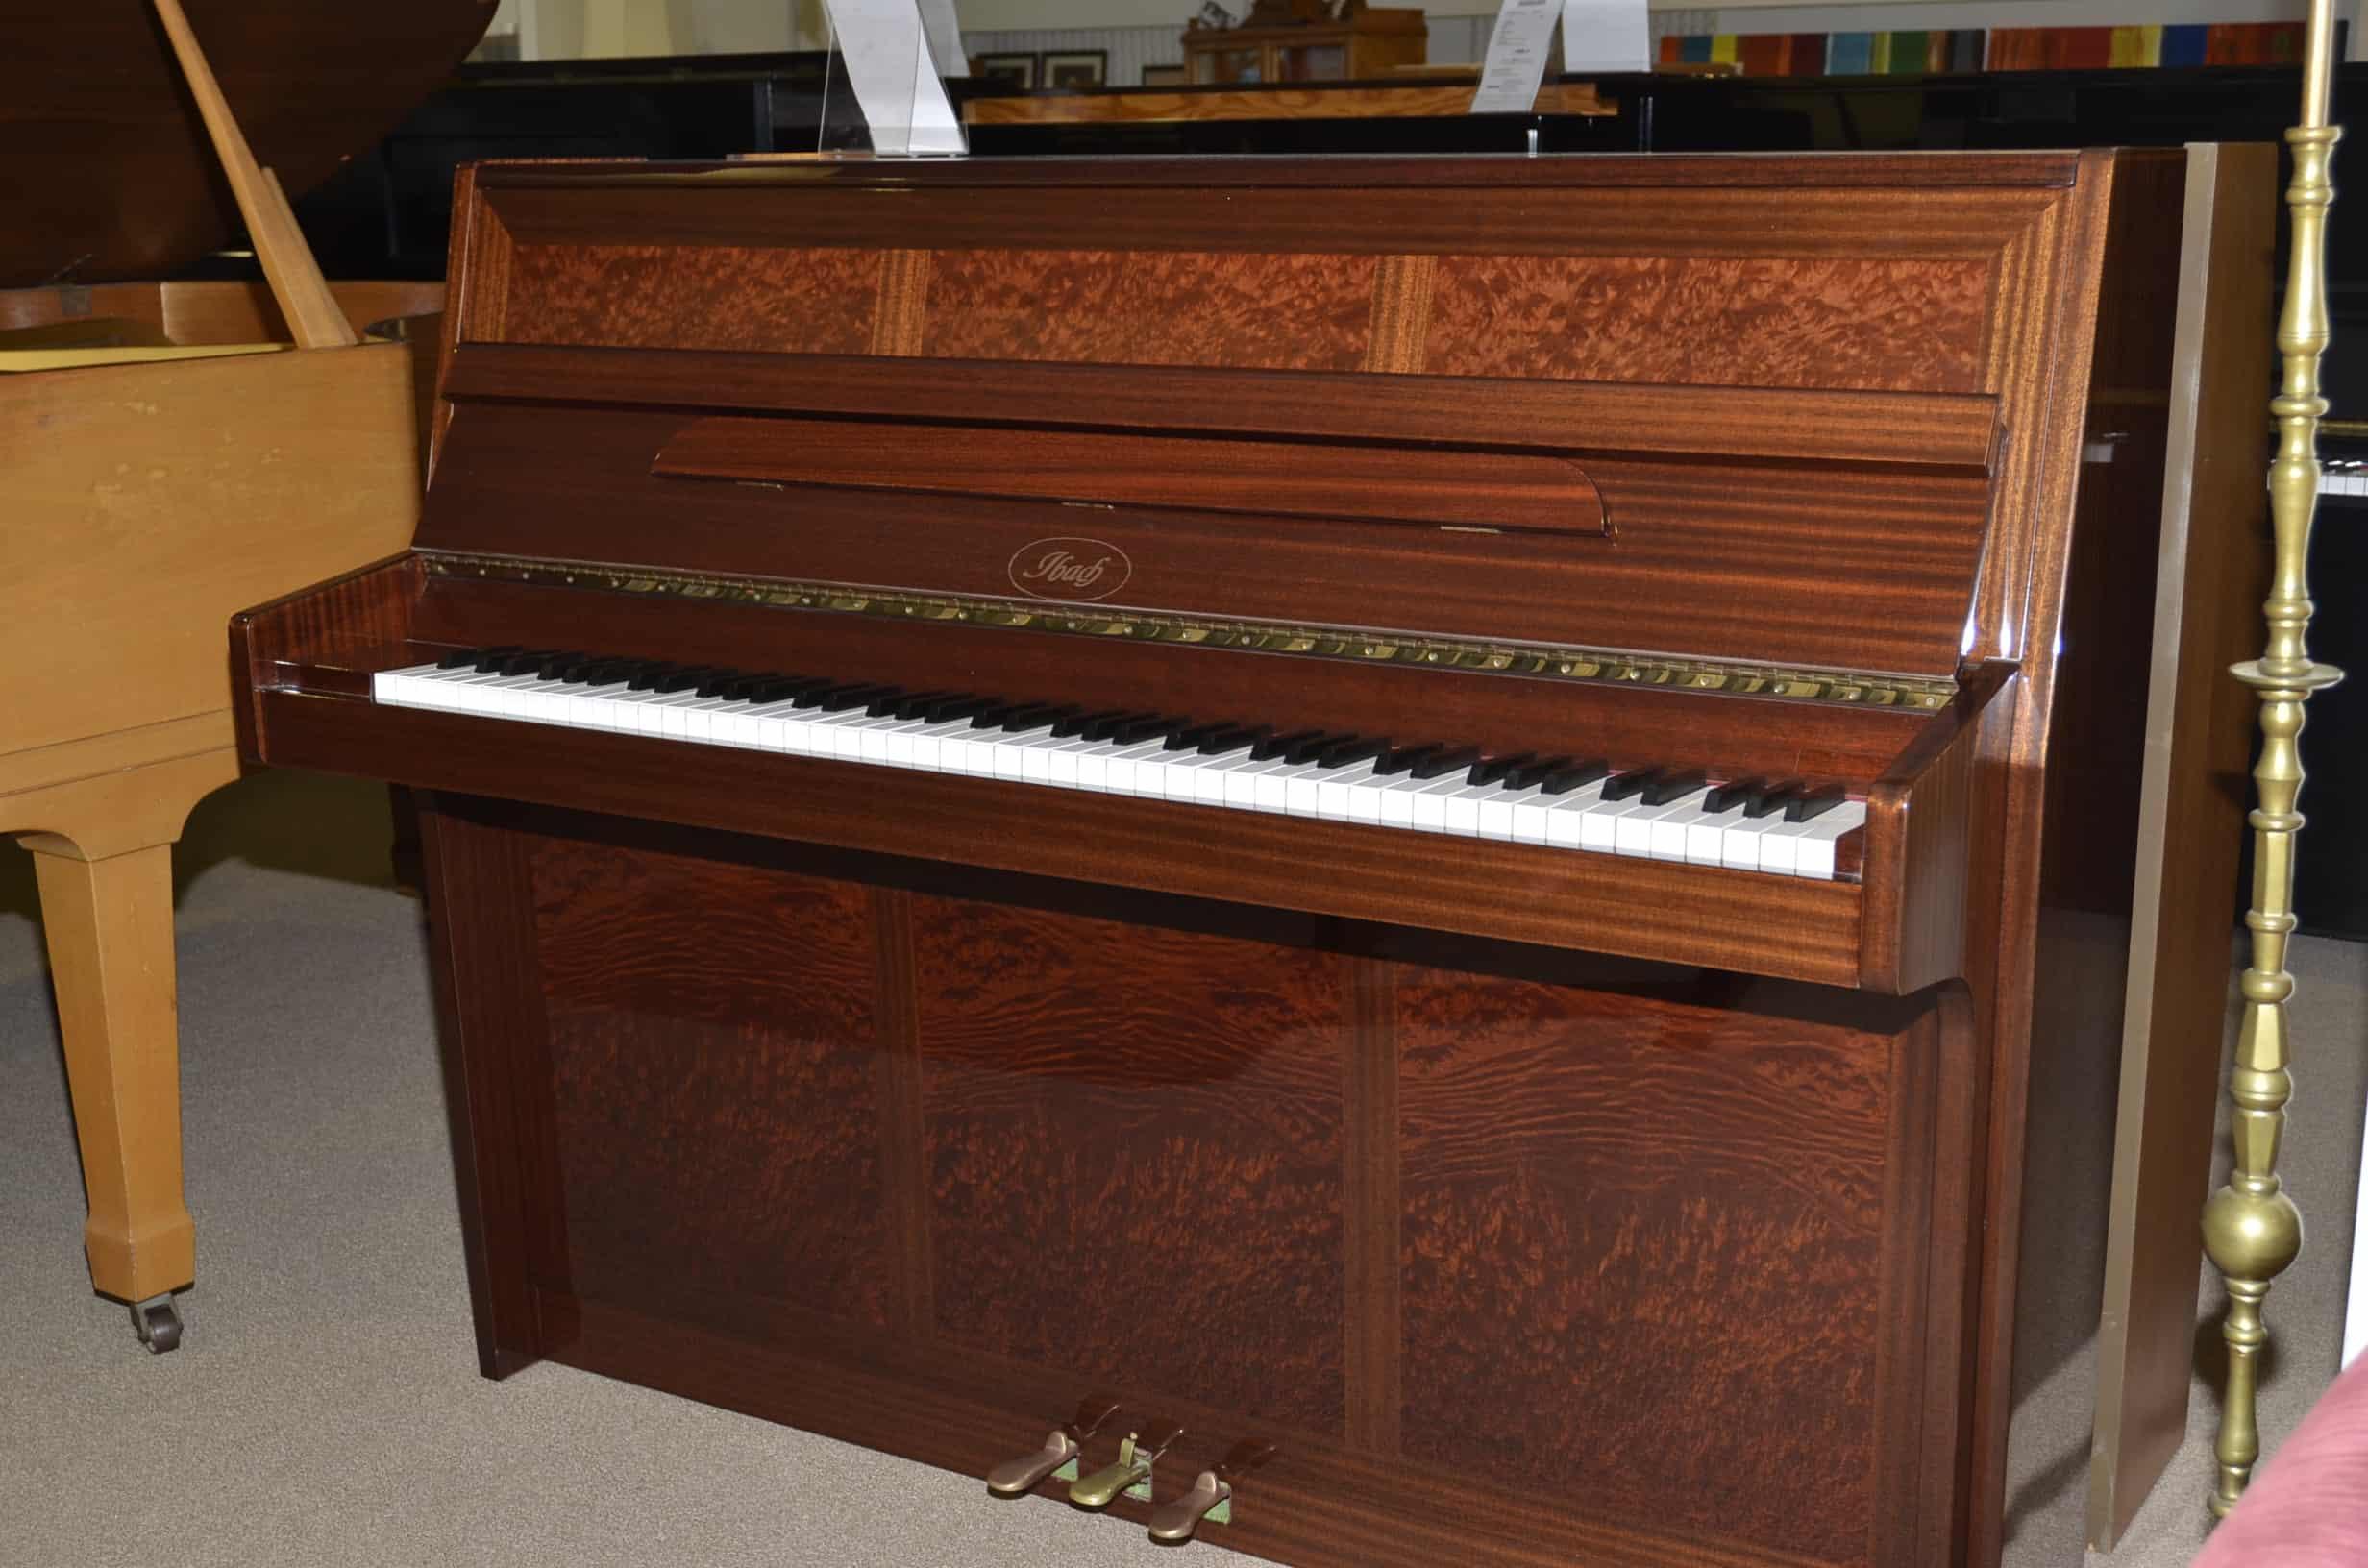 Ibach Klavier 115 Mahagoni poliert